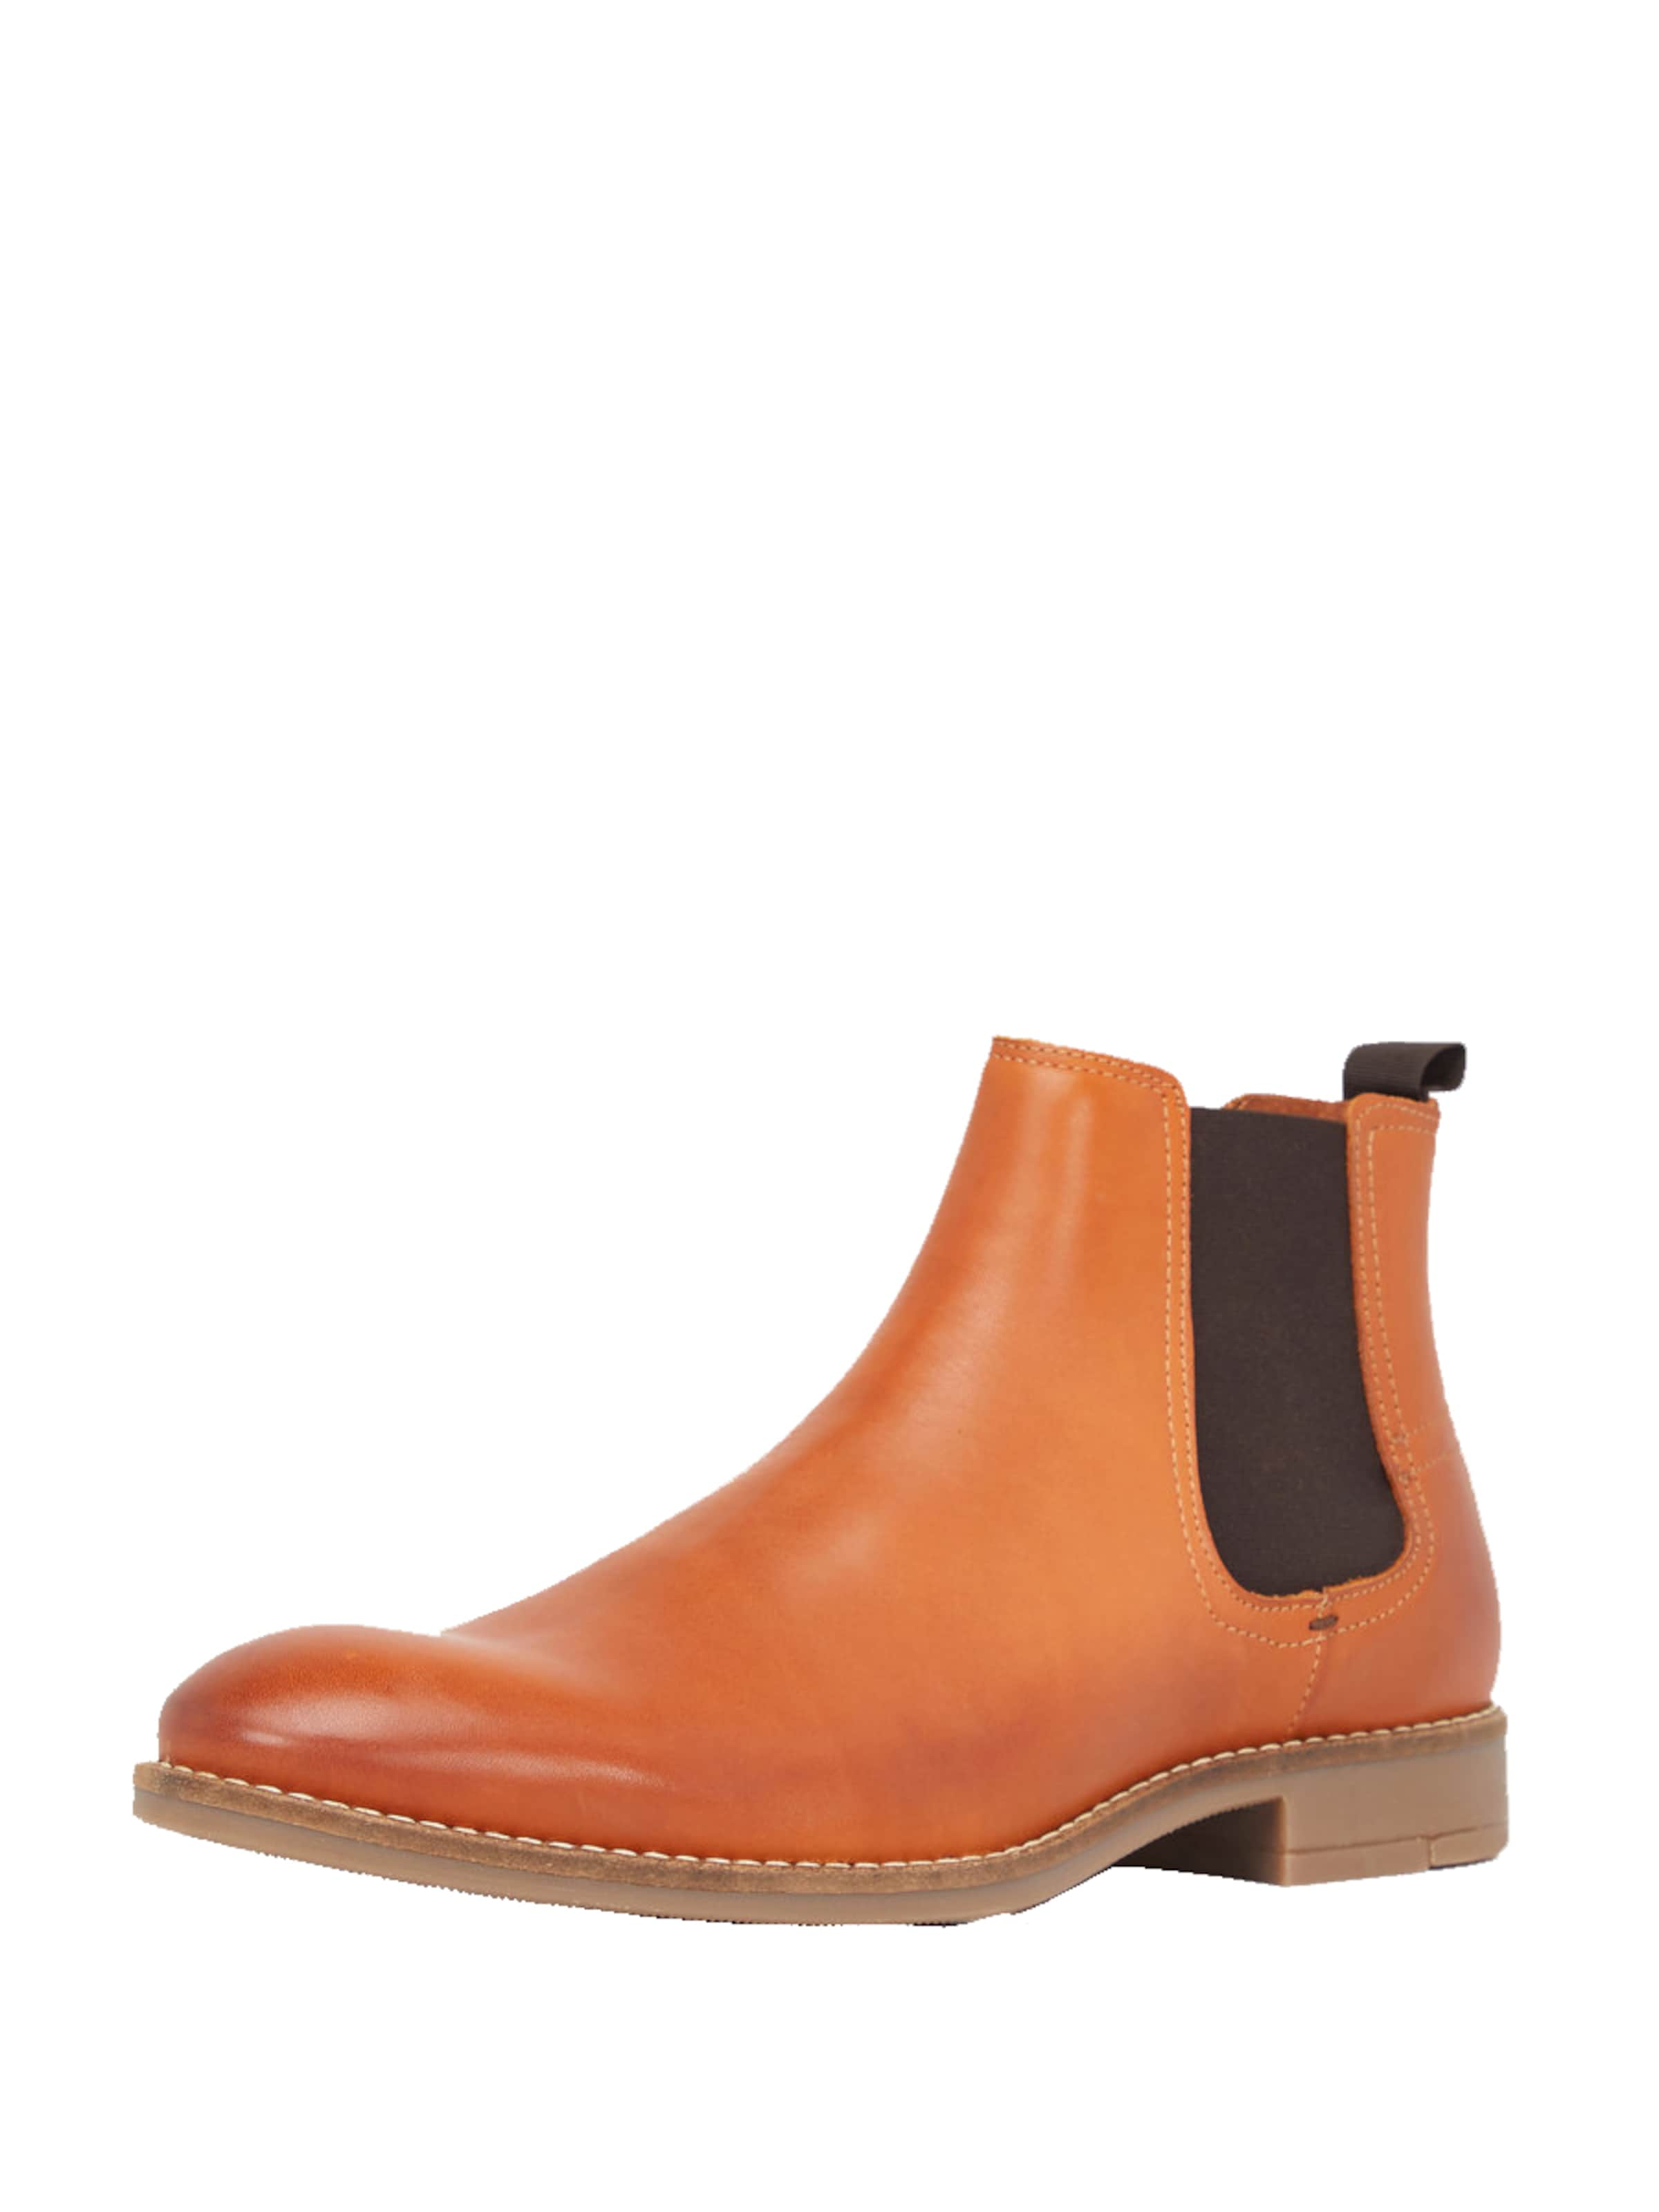 Bianco Klassische Herren-Stiefel Verschleißfeste billige Schuhe